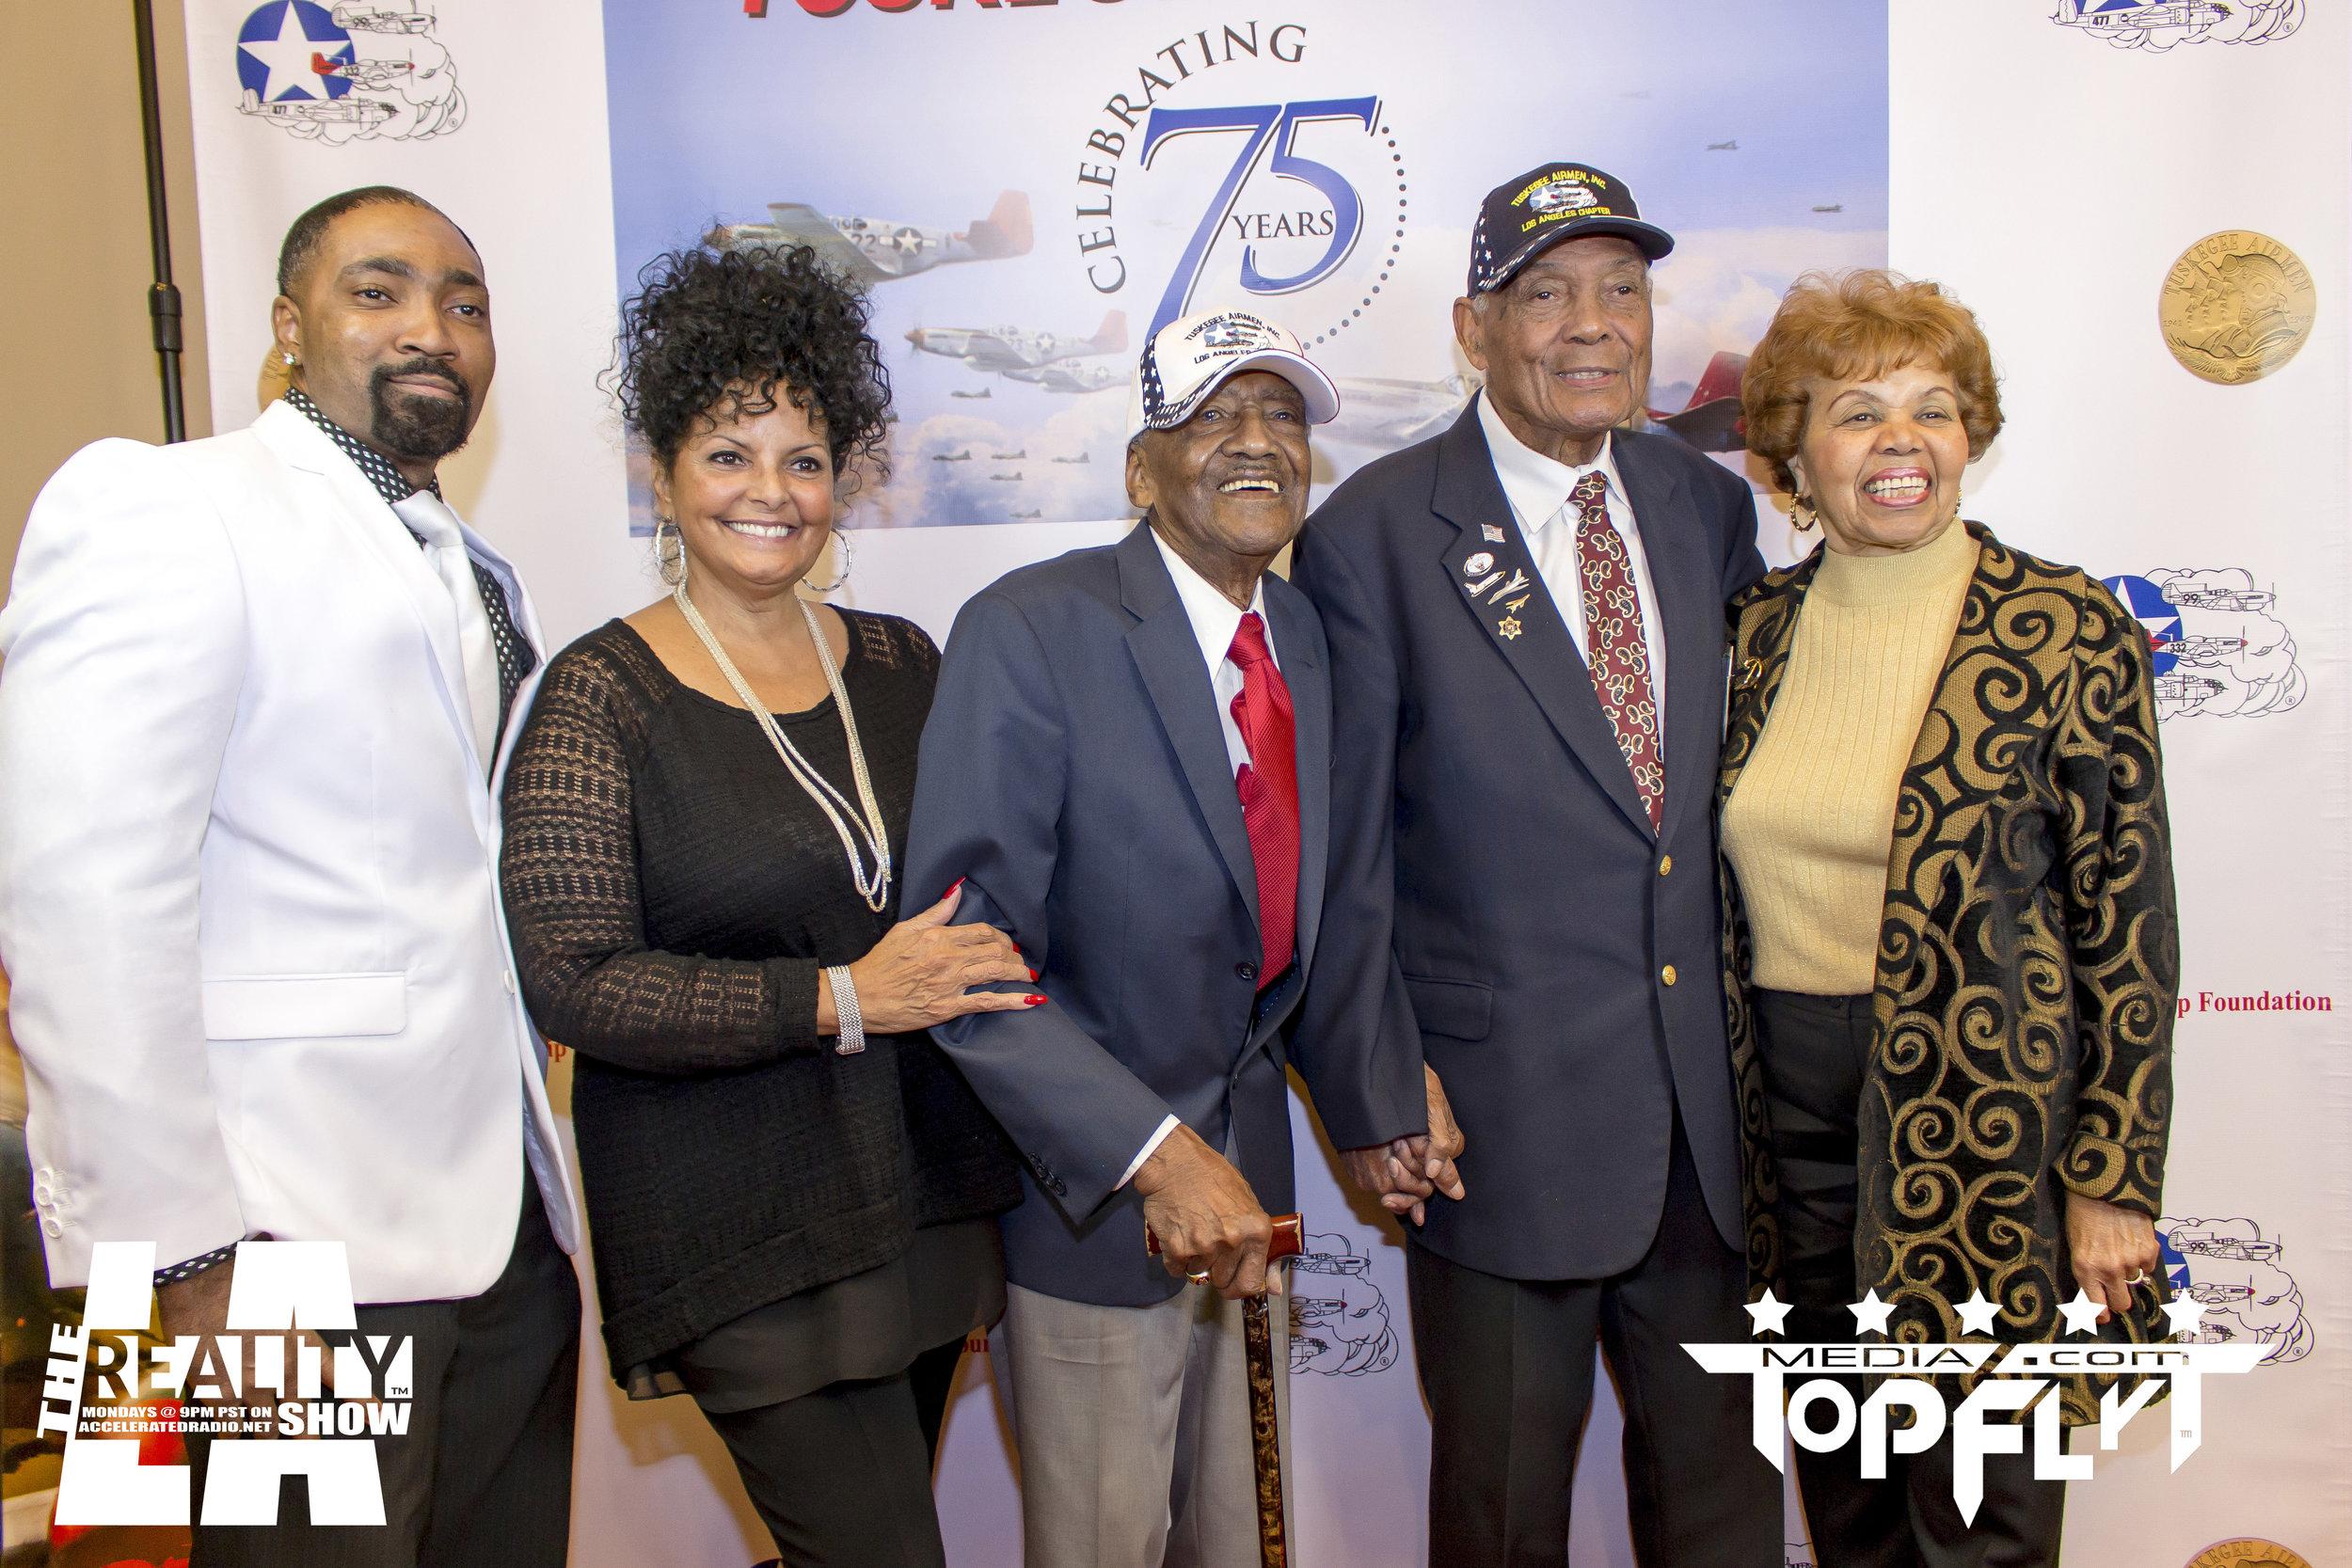 The Reality Show LA - Tuskegee Airmen 75th Anniversary VIP Reception_32.jpg